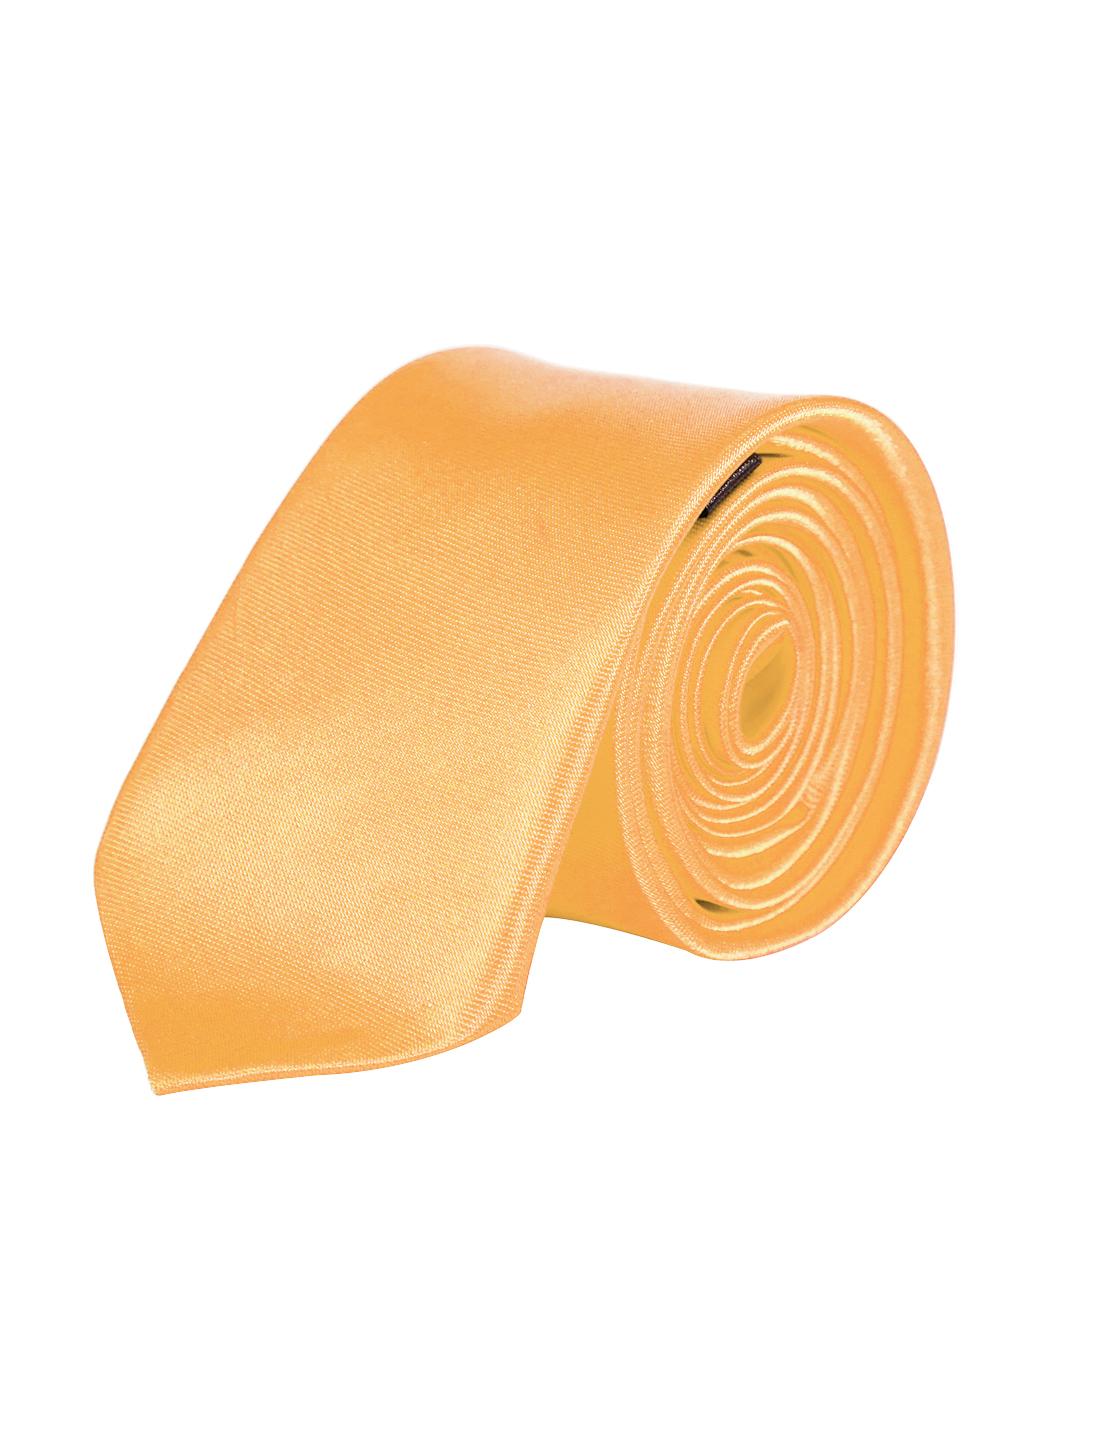 Men Adjustable Bussiness Party Clothes Decor Clip On Slim Necktie Gold